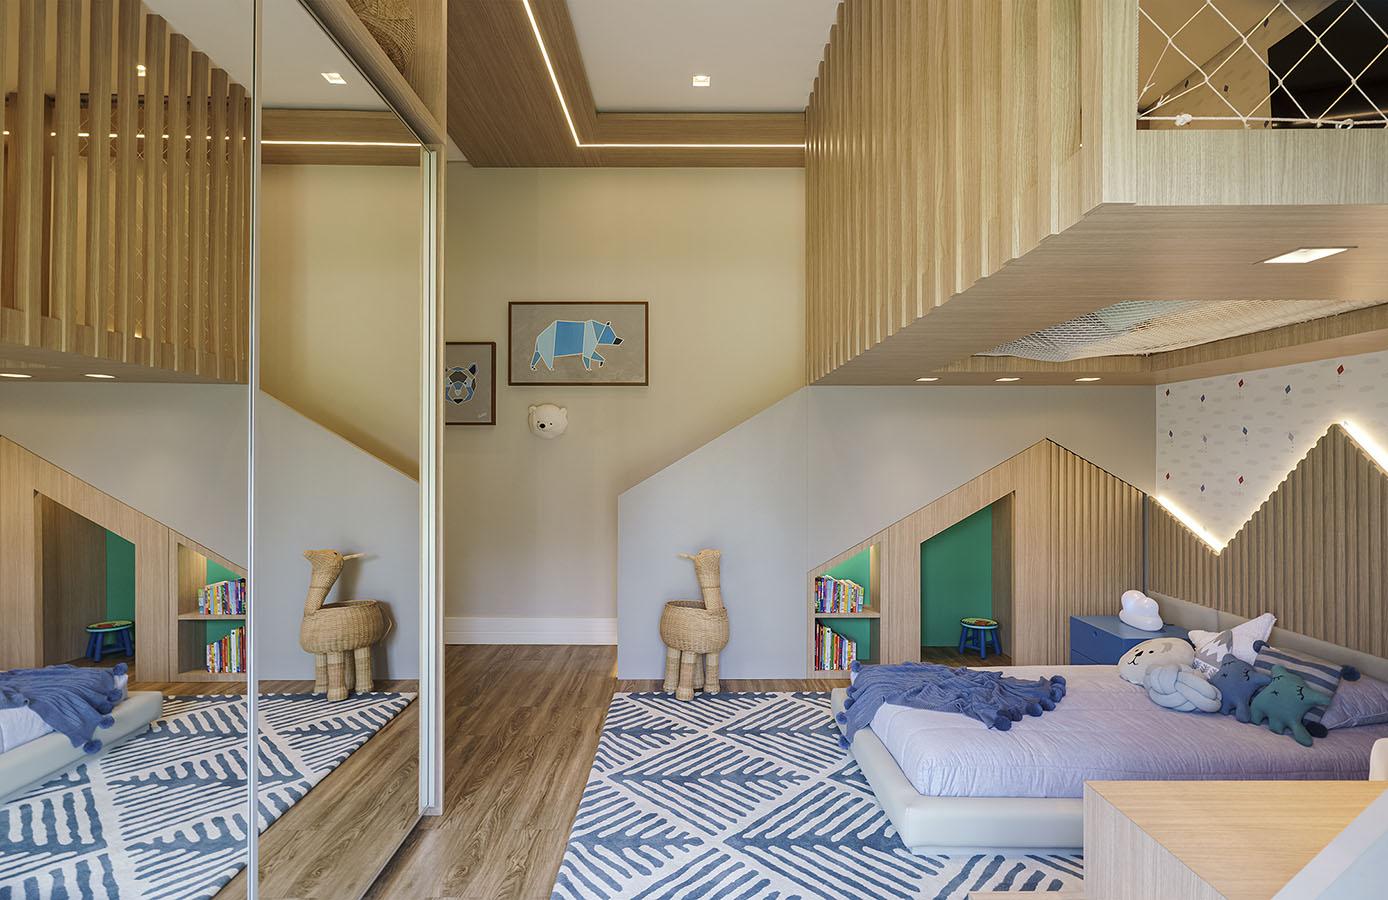 Arquiteto_Curitiba_Arquiteta_AlessandraGandolfi_Residência_LFP_Quarto_Infantil_8